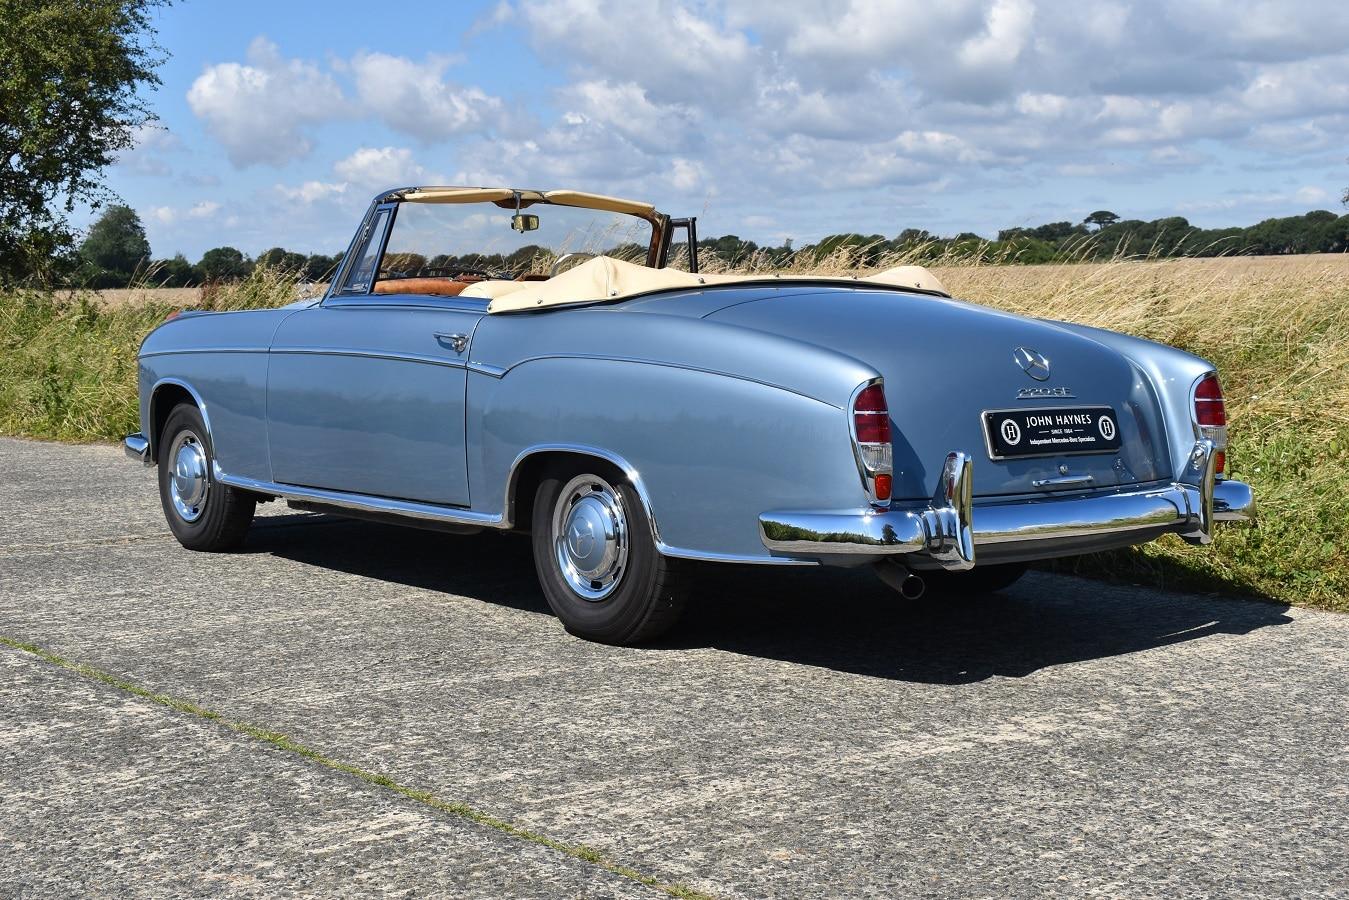 1960 Mercedes-Benz 220SE Ponton Cabriolet in Blue Metallic